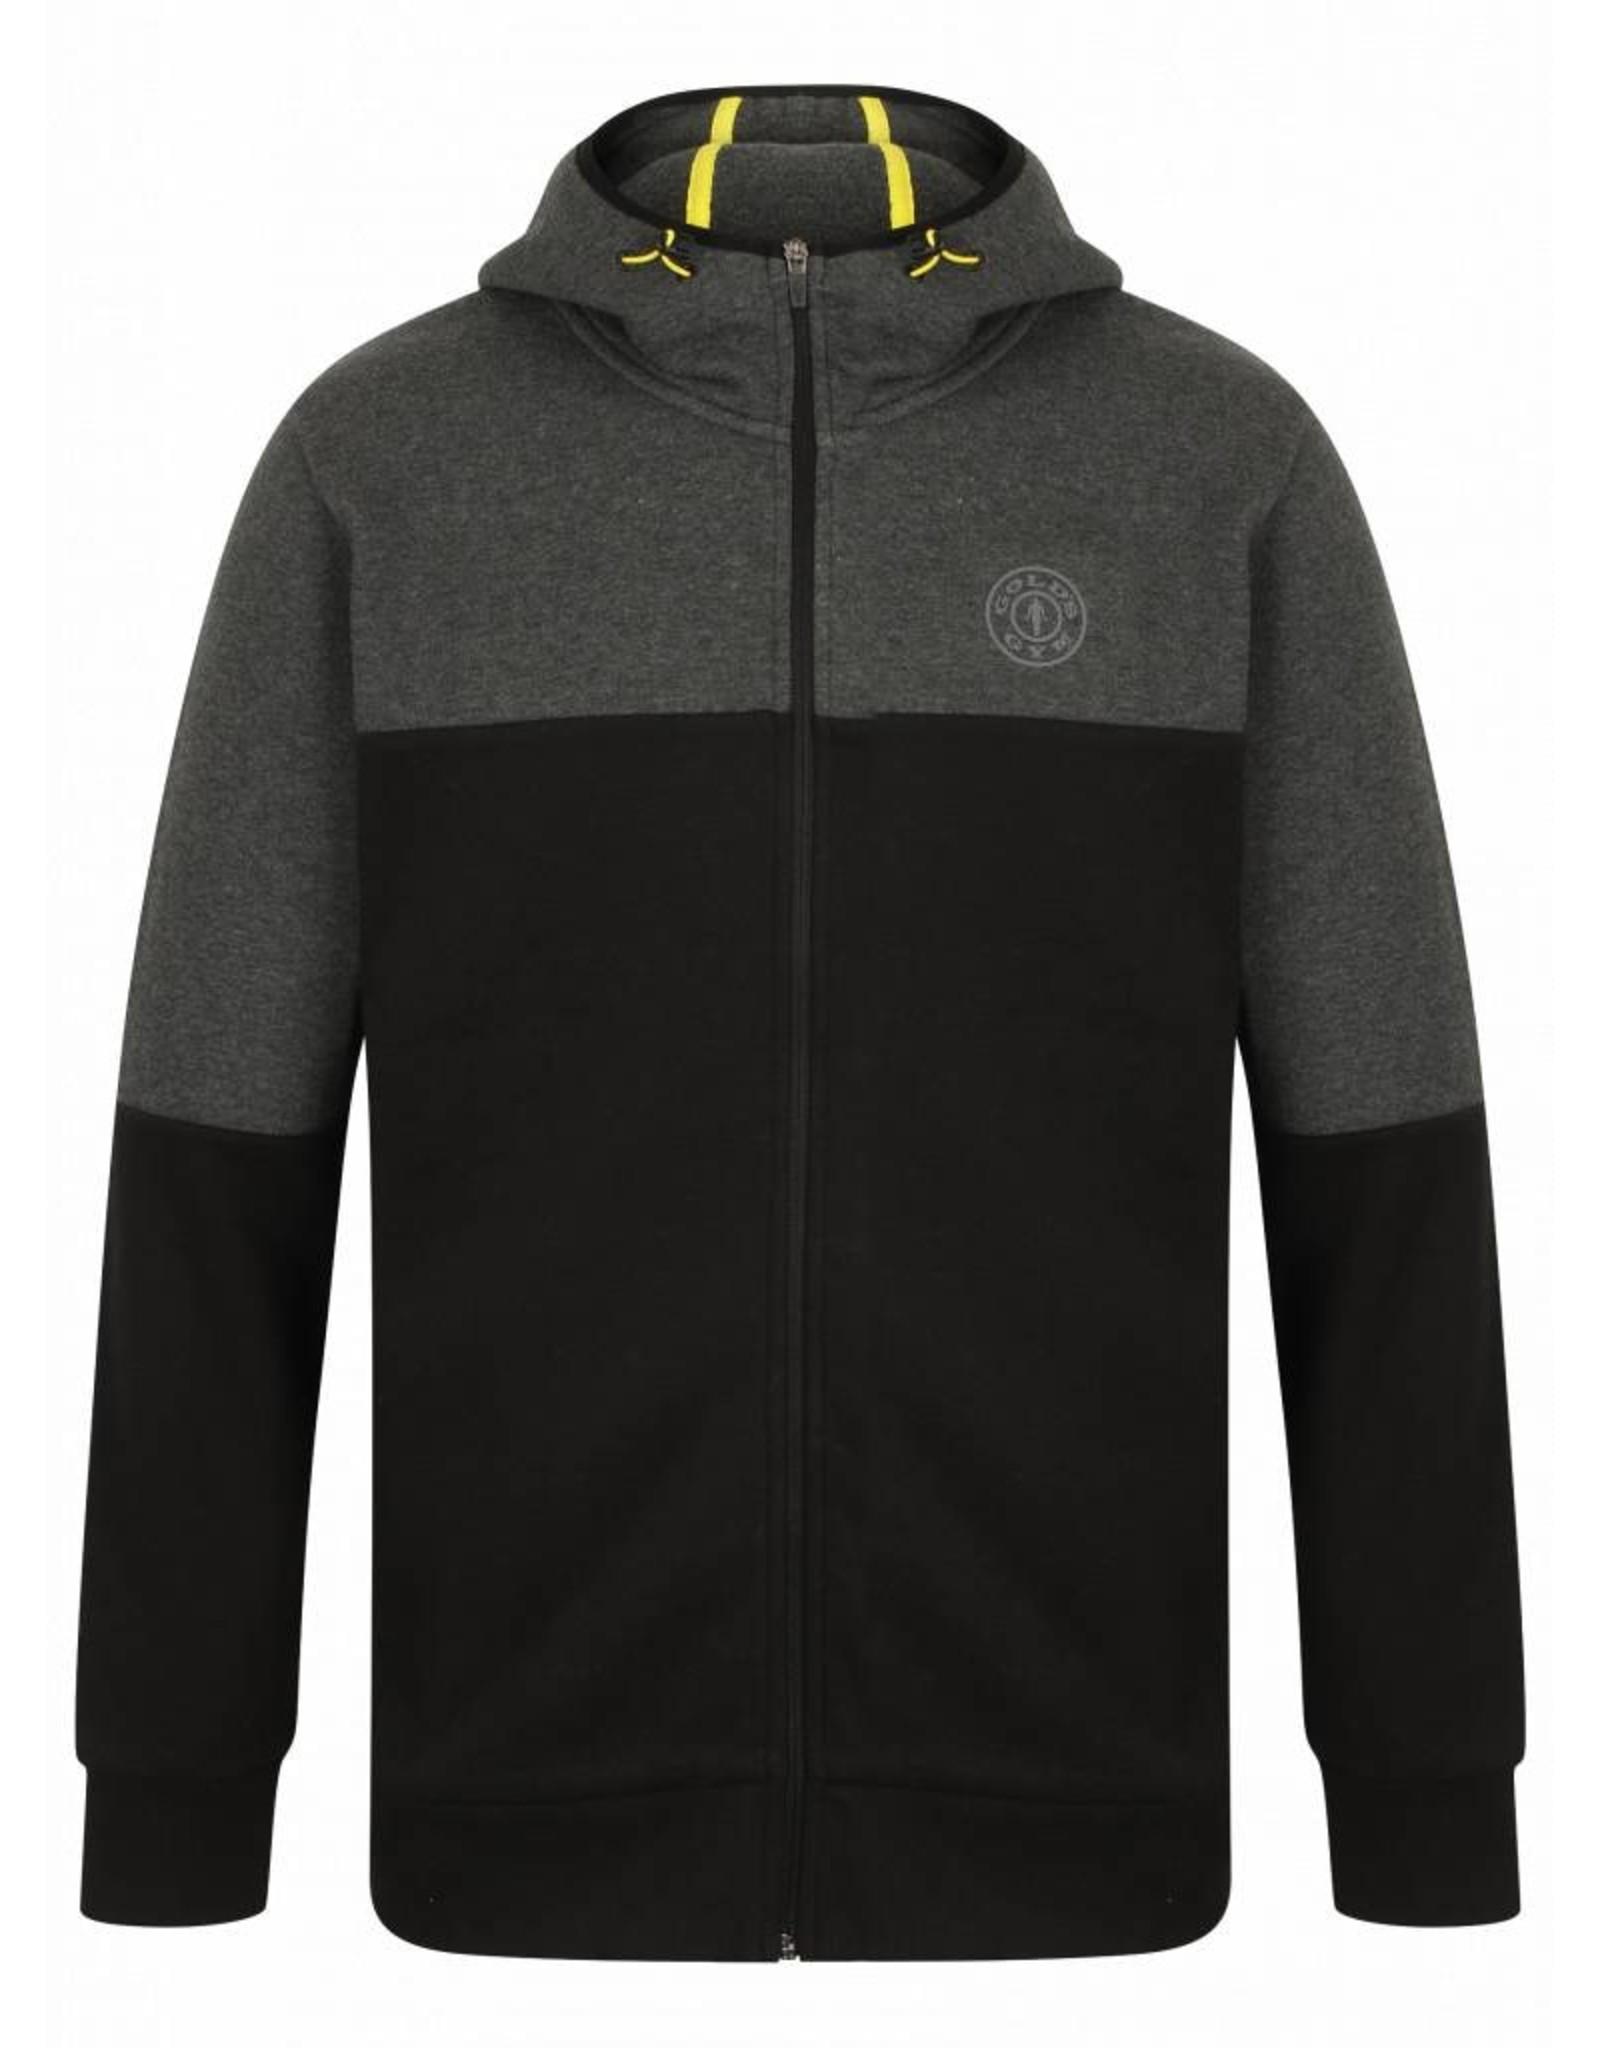 Gold's Gym FZ Tech Hoodie - Black/Charcoal